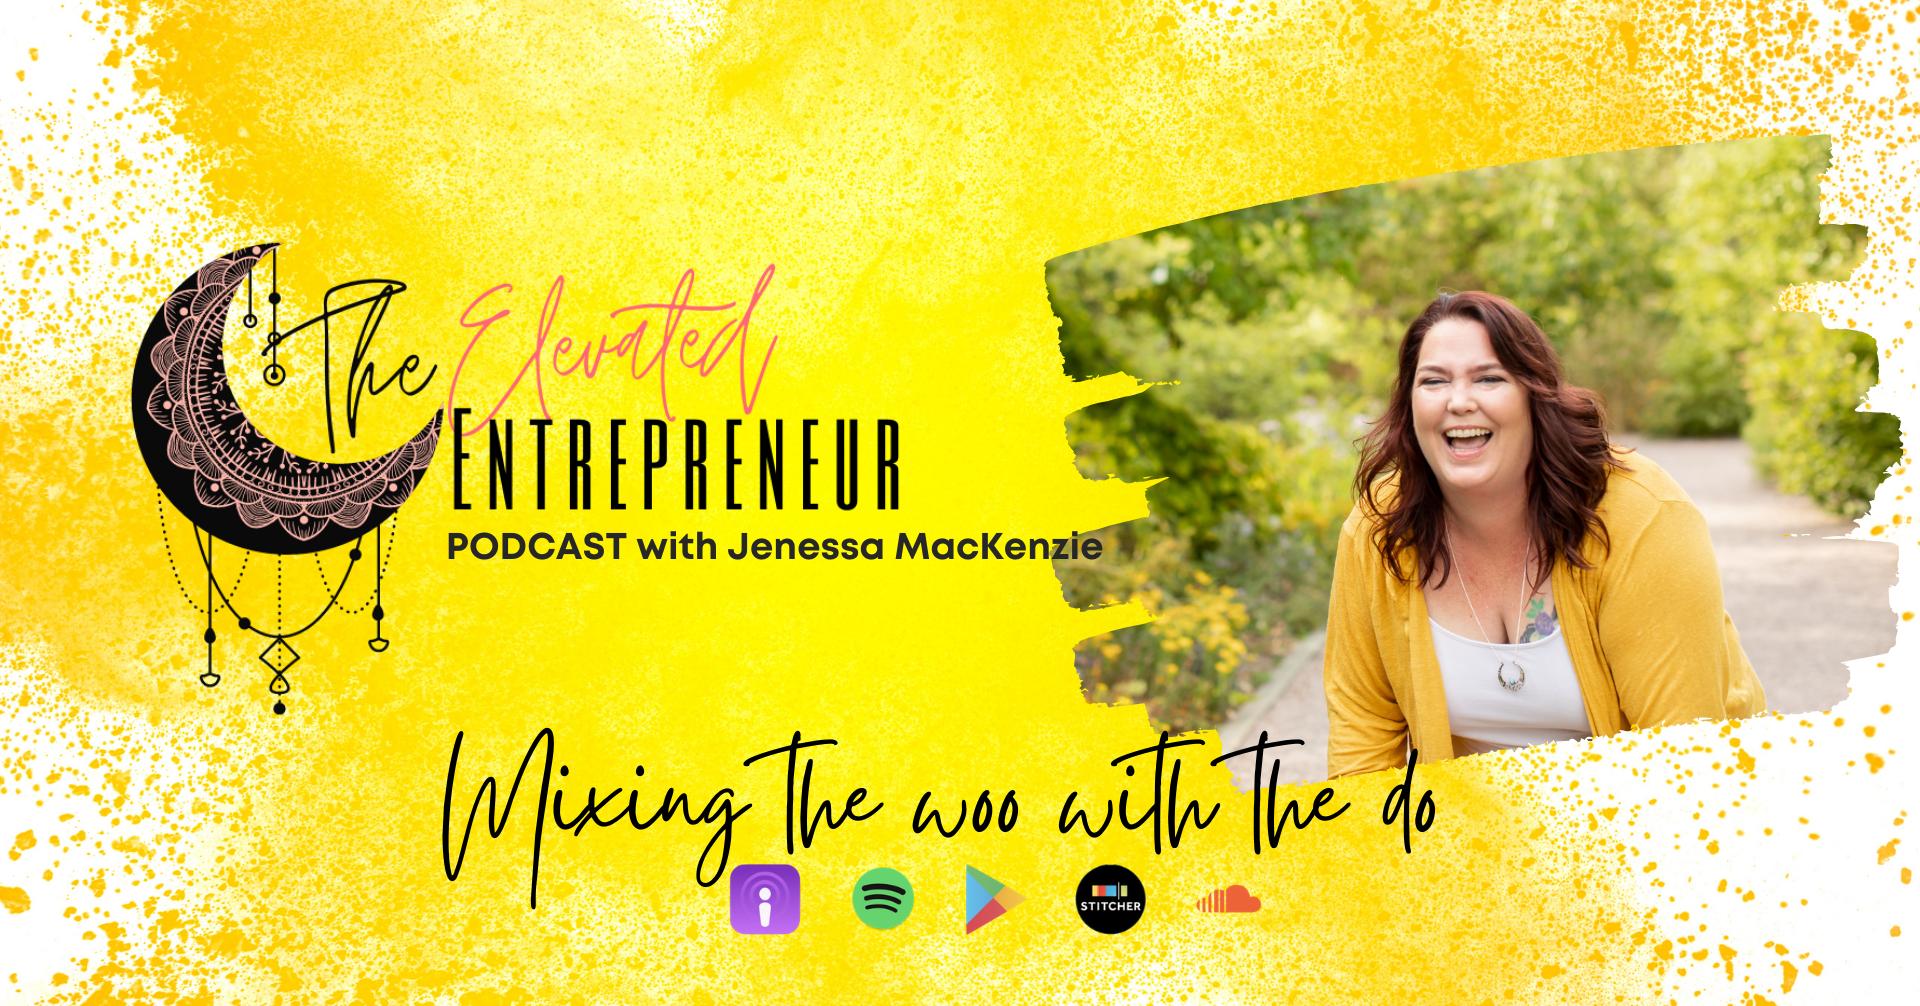 The Elevate Podcast with Jenessa MacKenzie